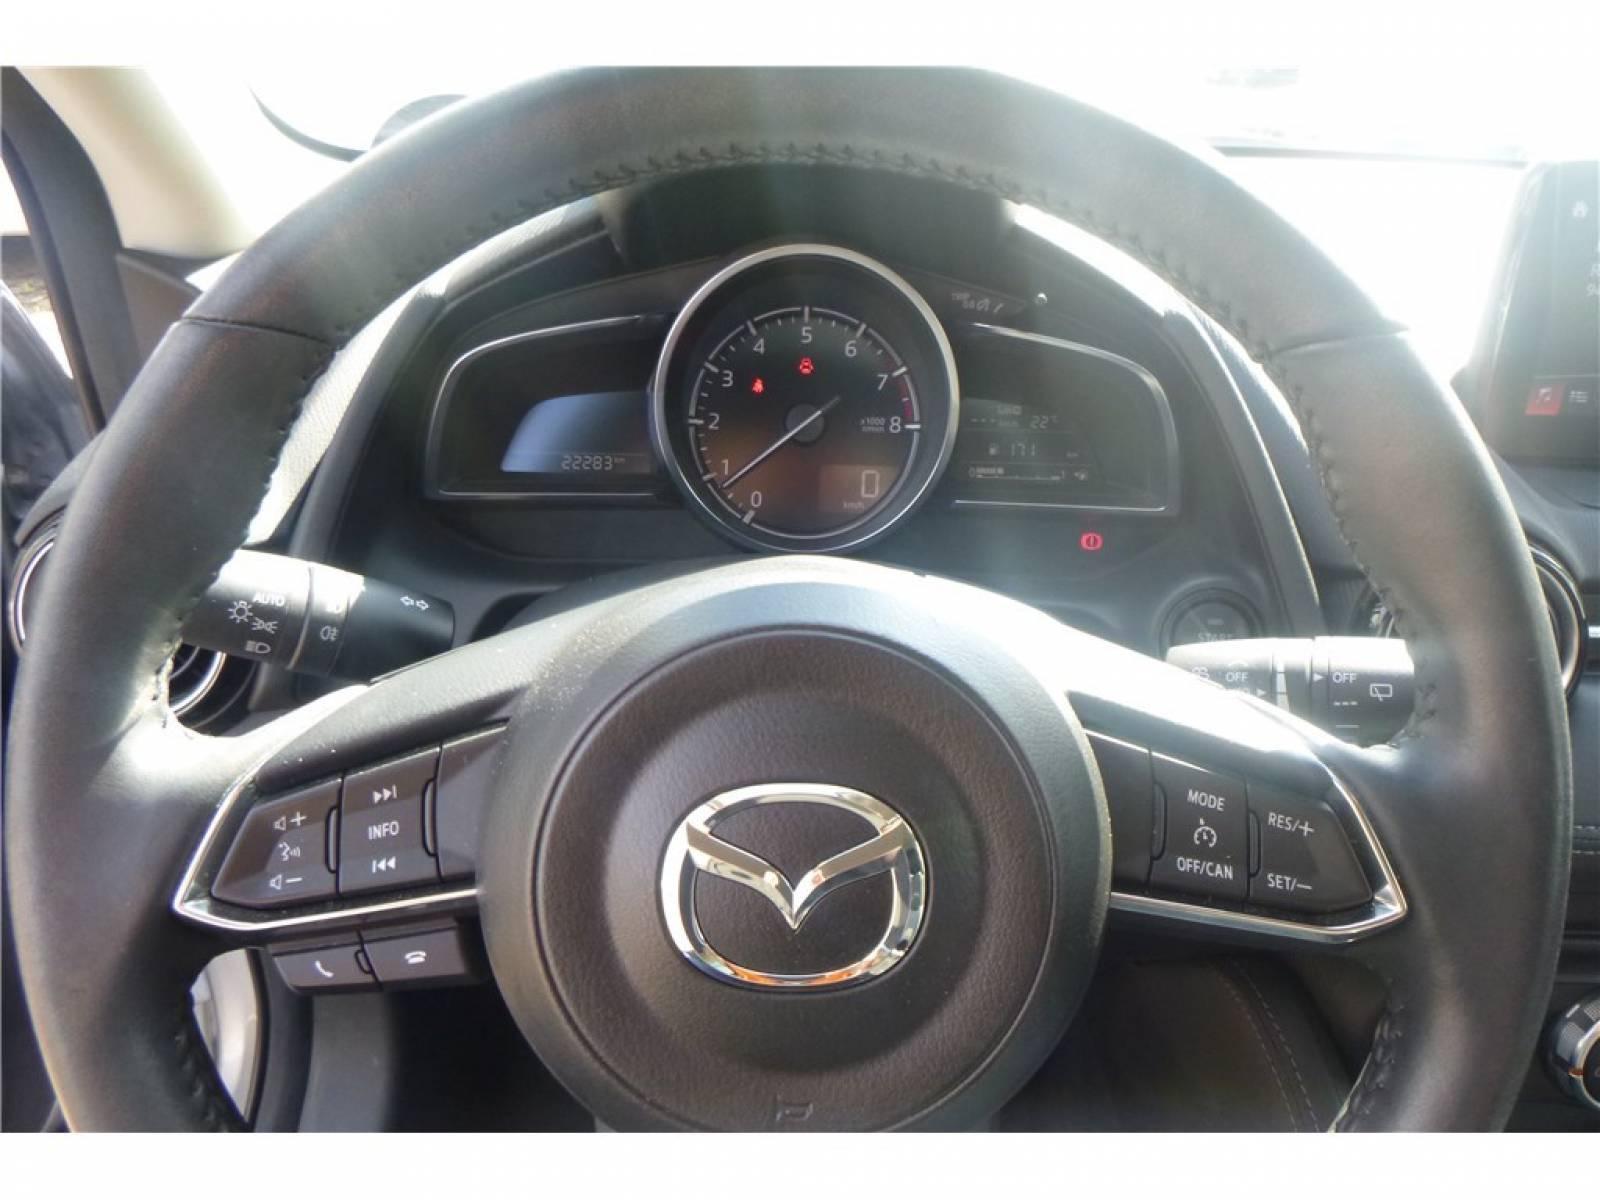 MAZDA Mazda2 1.5L SKYACTIV-G 90ch - véhicule d'occasion - Groupe Guillet - Chalon Automobiles - 71100 - Chalon-sur-Saône - 30